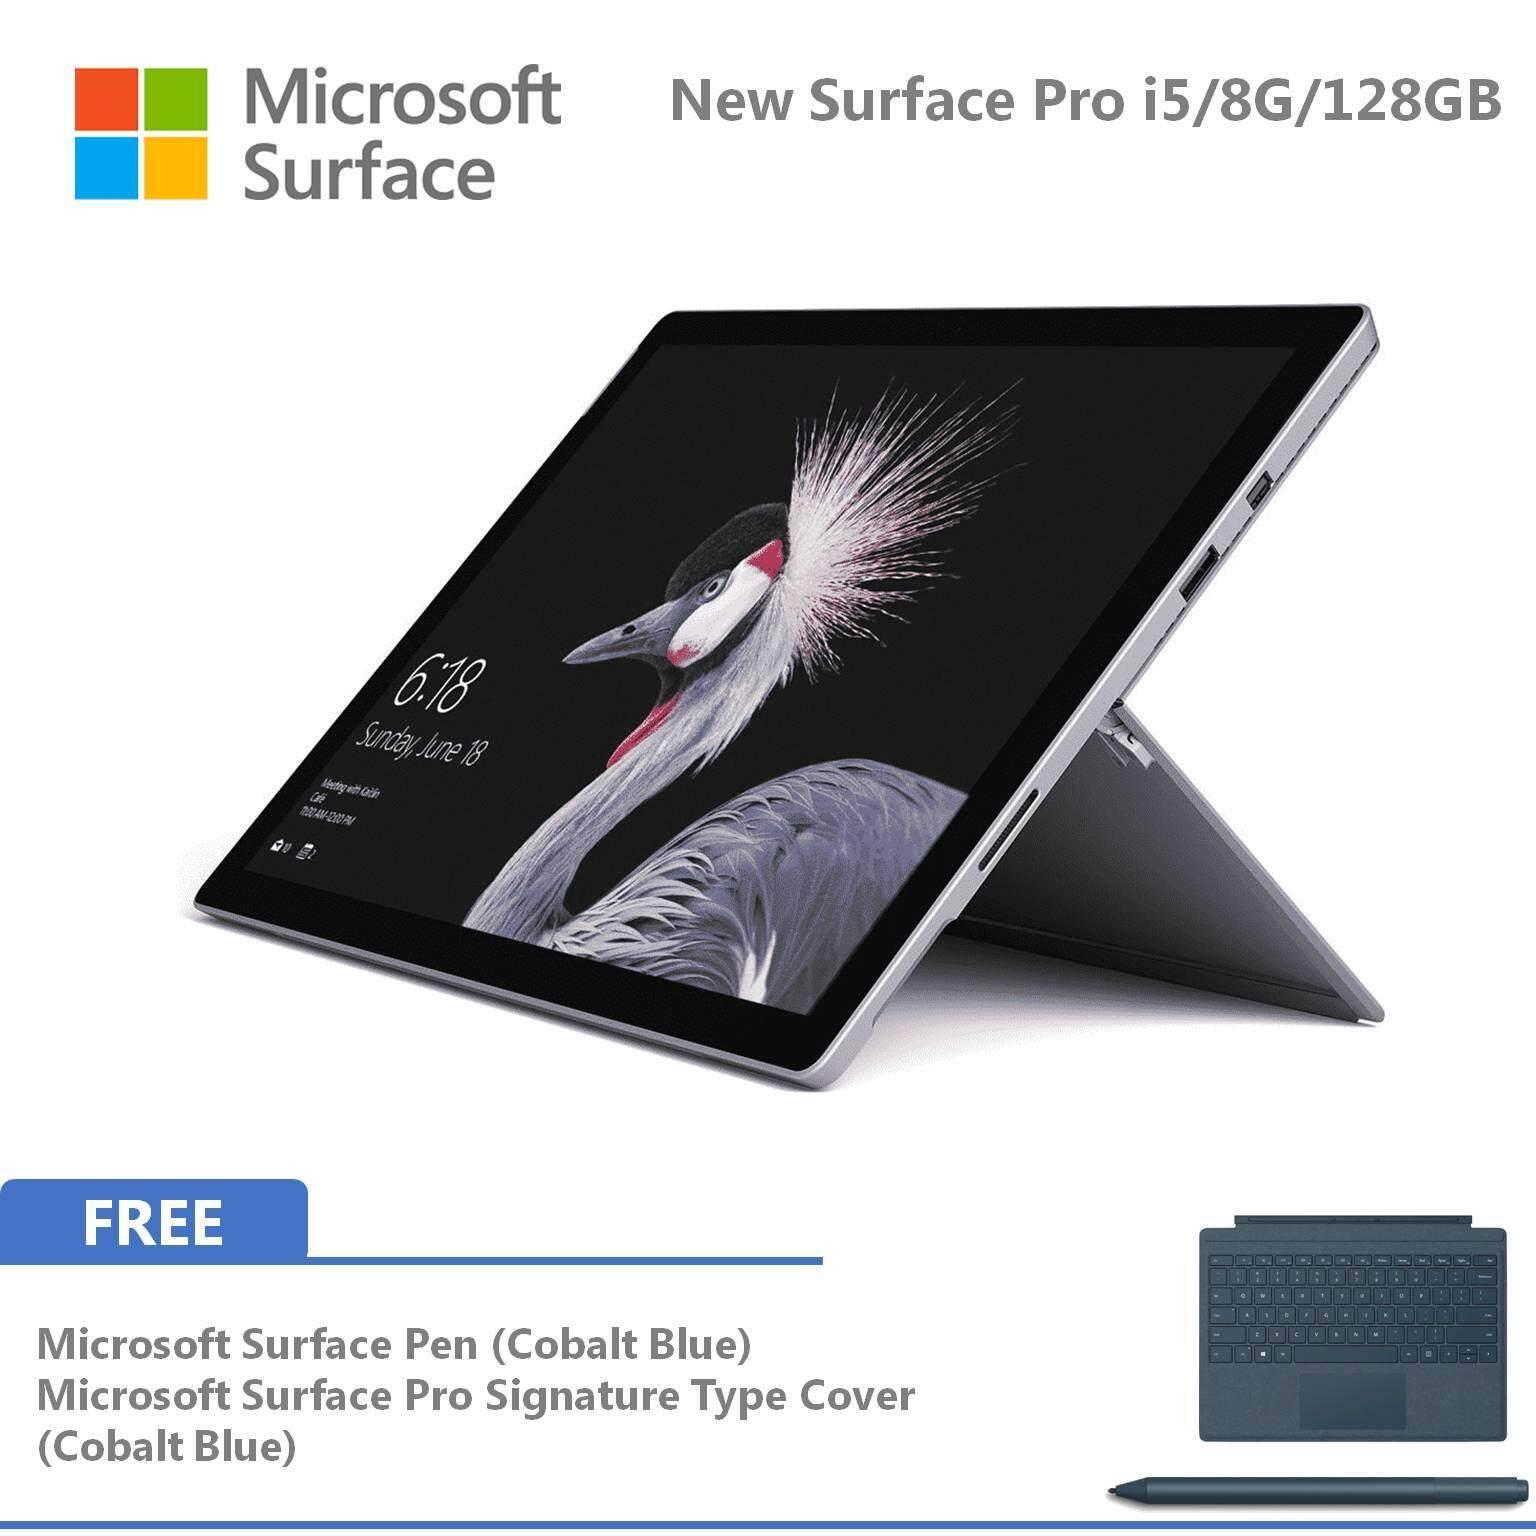 Microsoft New Surface Pro - 128GB / Intel Core i5 - 8GB RAM FOC Signature Type Cover + Pen Malaysia